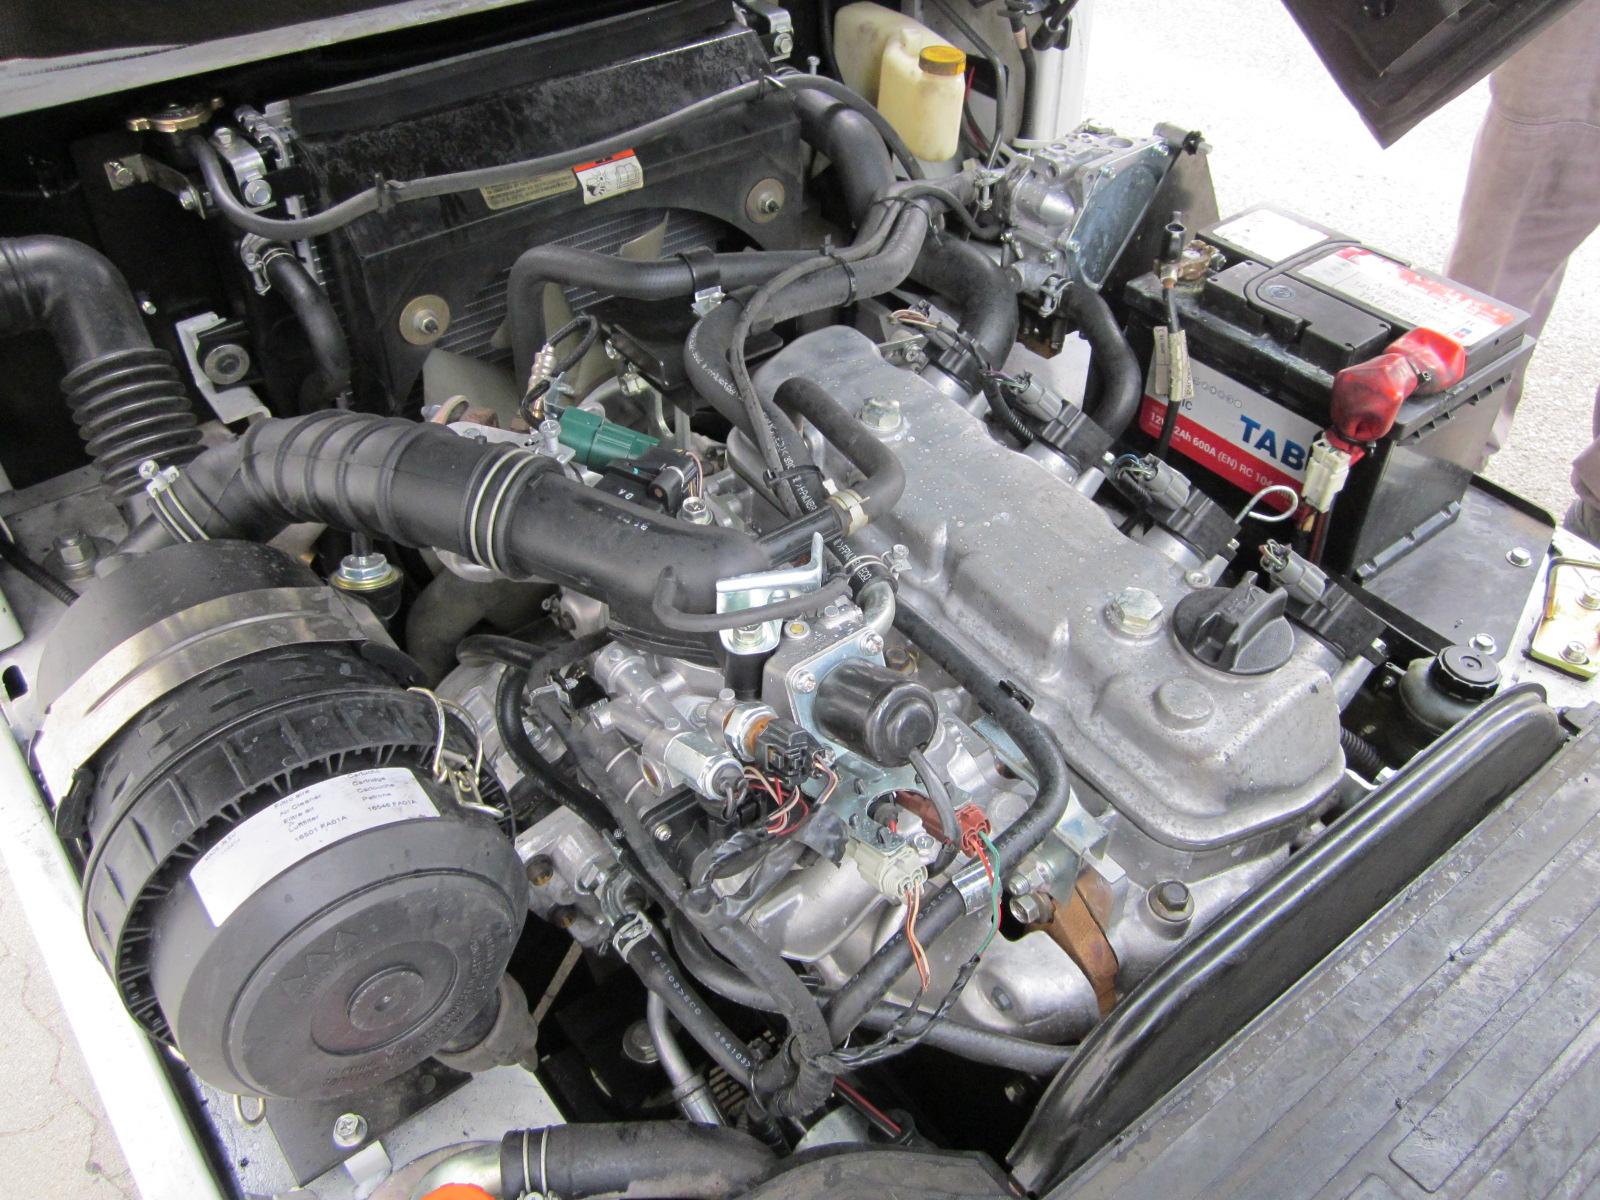 Nissan DX15LPG PG154729 targonca2